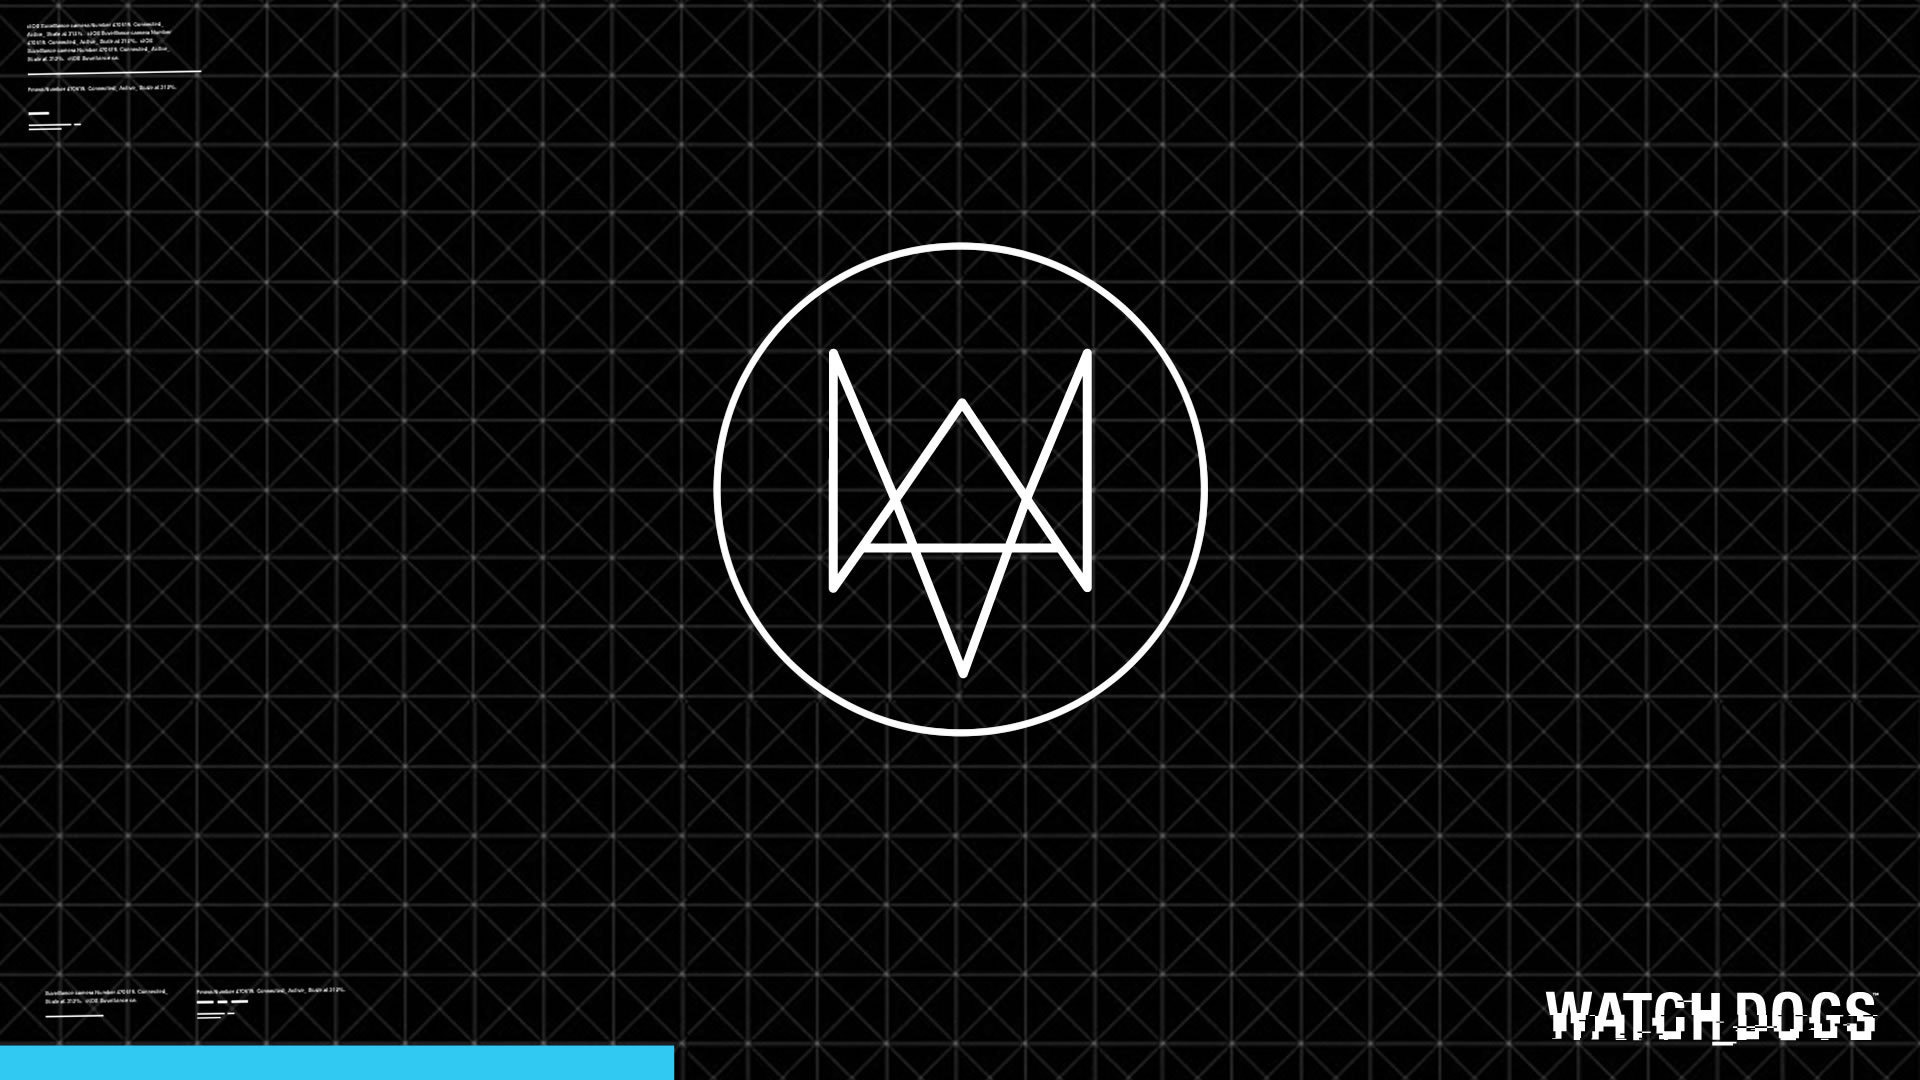 watch dogs game login logo hd 1920x1080 1080p wallpaper and 1920x1080